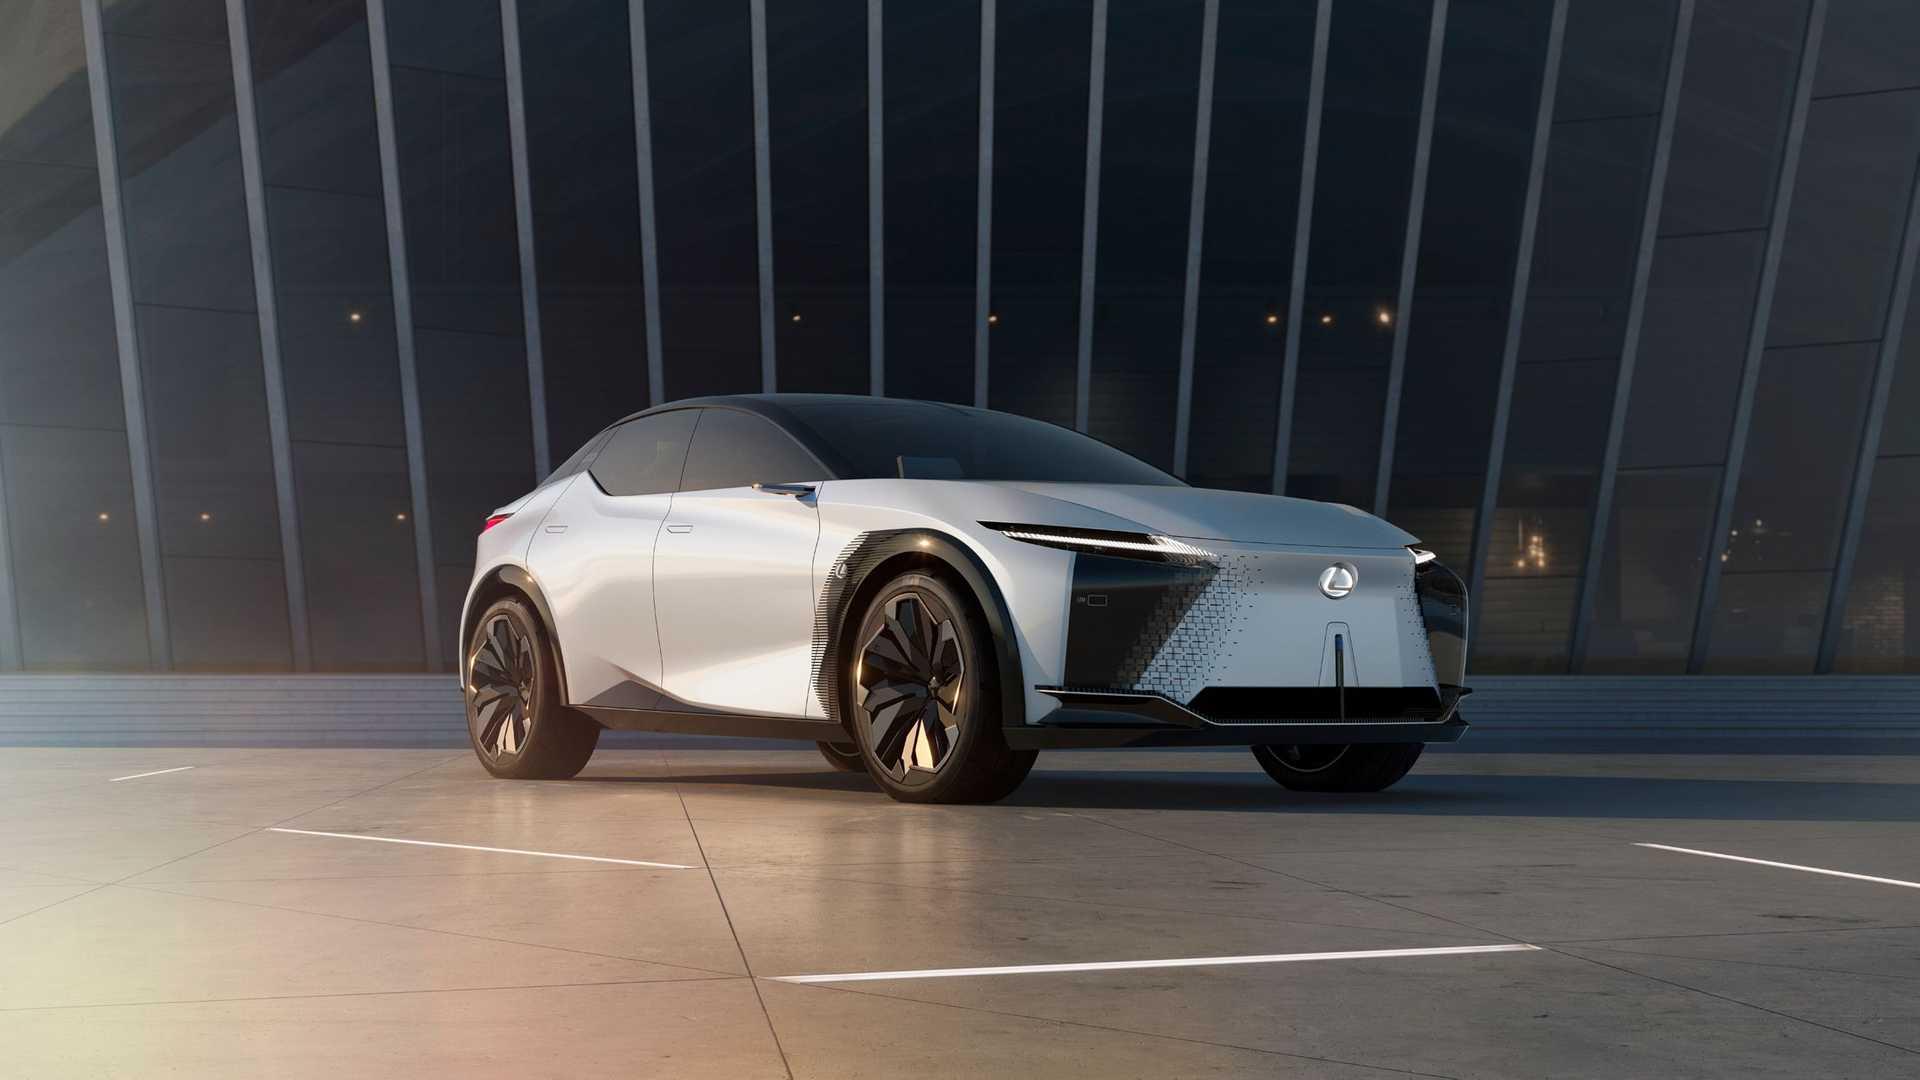 Lexus 推出 LF-Z 電動概念車之際,也宣告未來四年內品牌的電動化佈局。